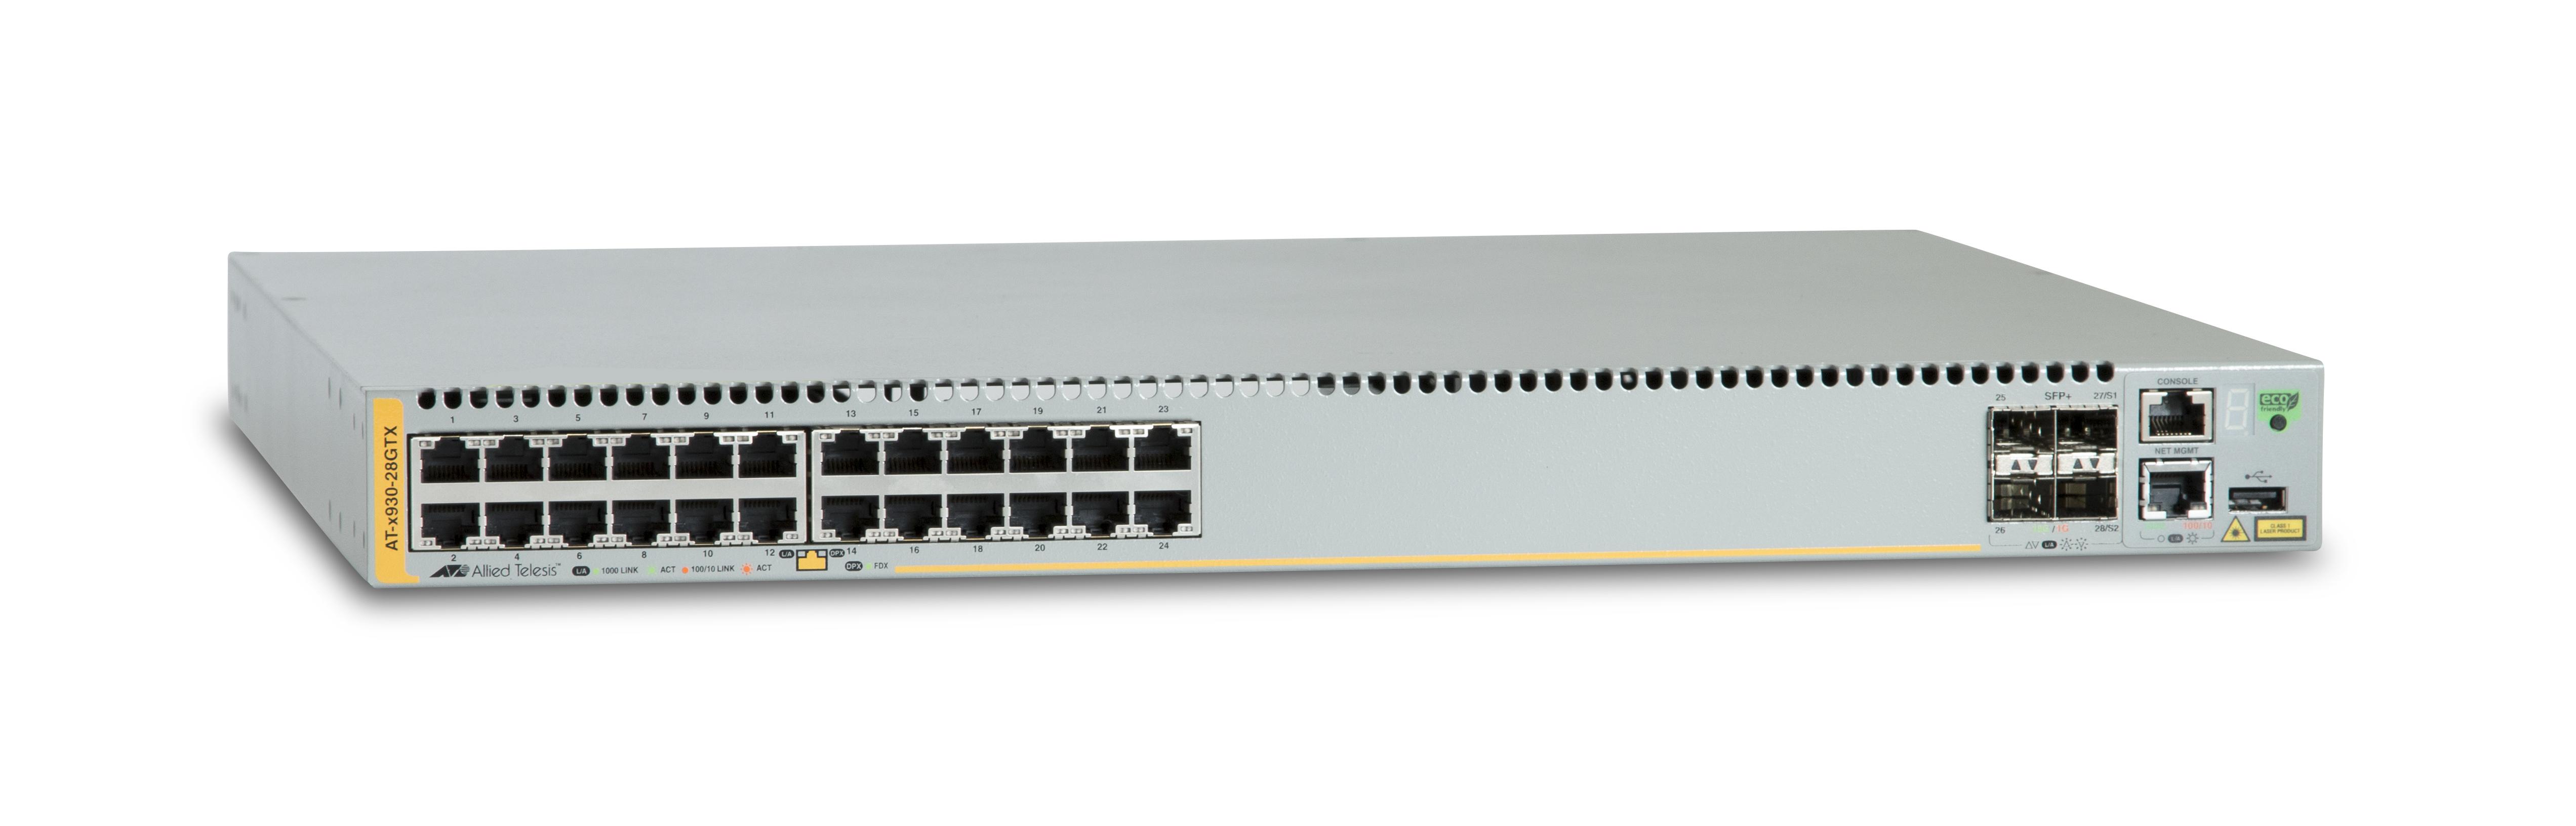 Allied Telesis AT x930-28GTX - Switch - L3